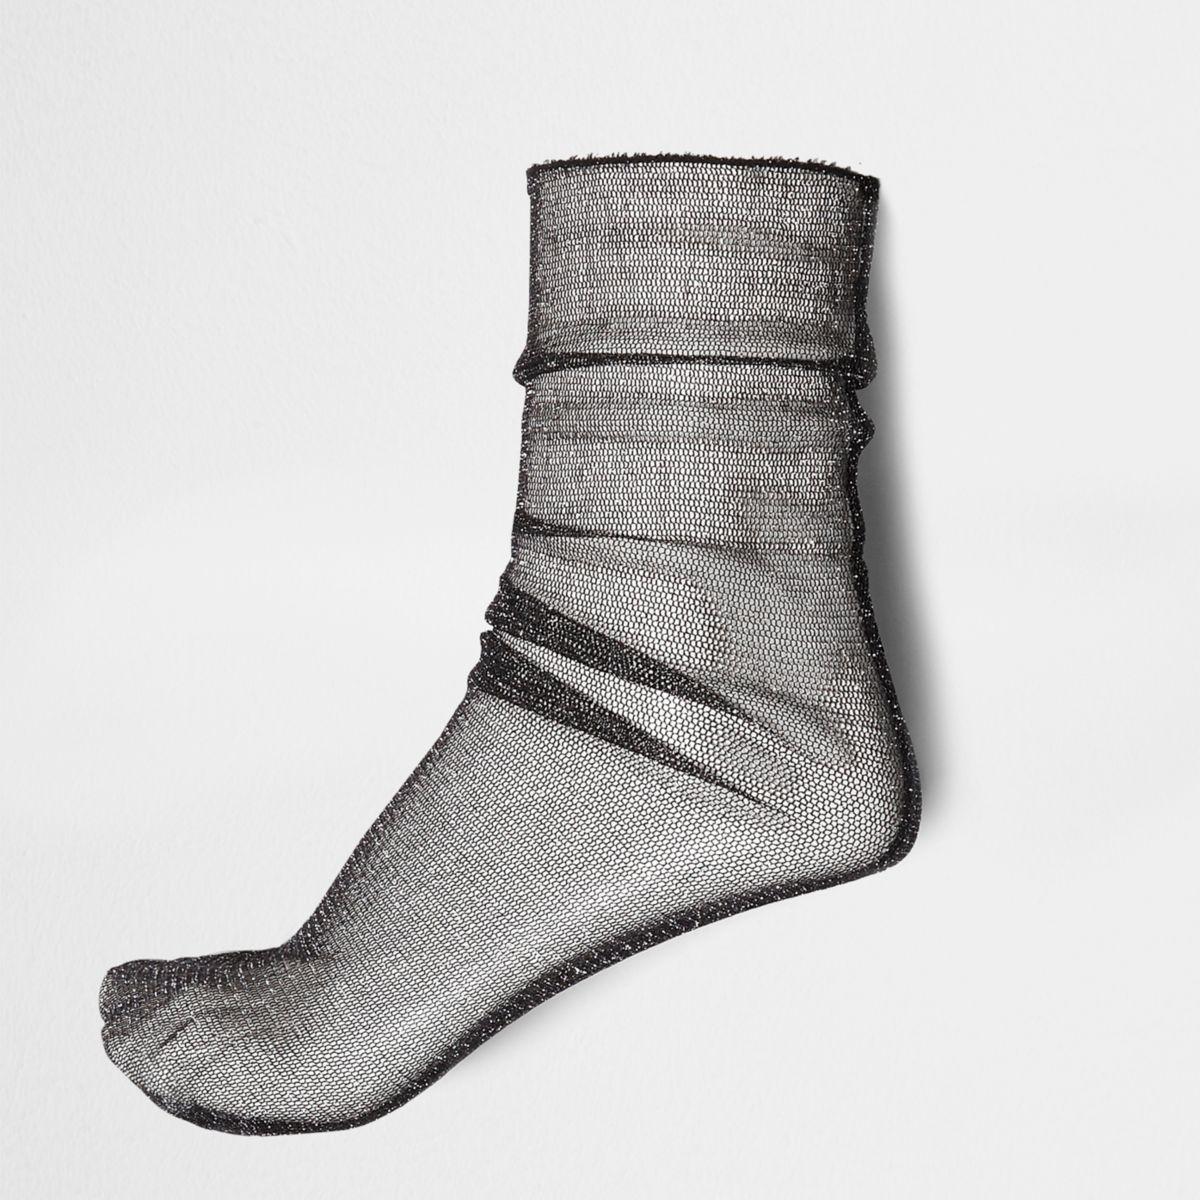 Black lurex stitch sheer socks